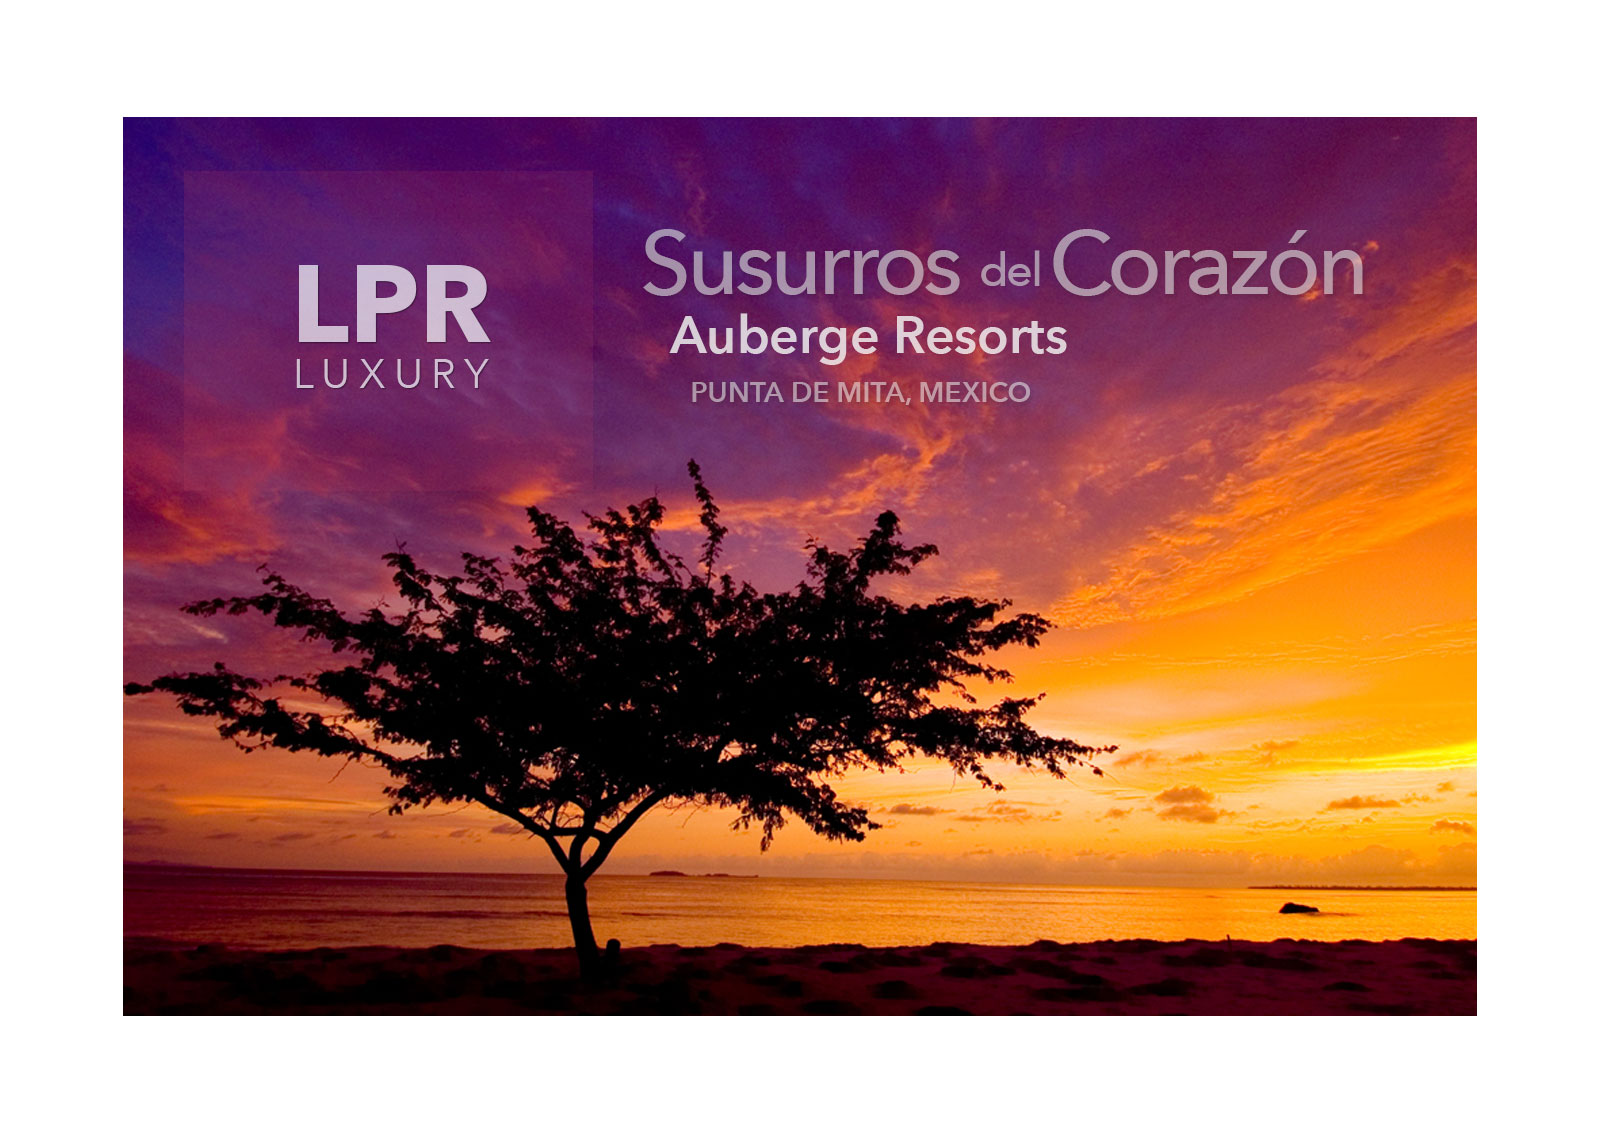 Auberge Resorts - Punta de Mita Susurros del Corazón - Luxury beachfront resort residences for sale - Luxury Real estate North of Puerto Vallarta, Mexico